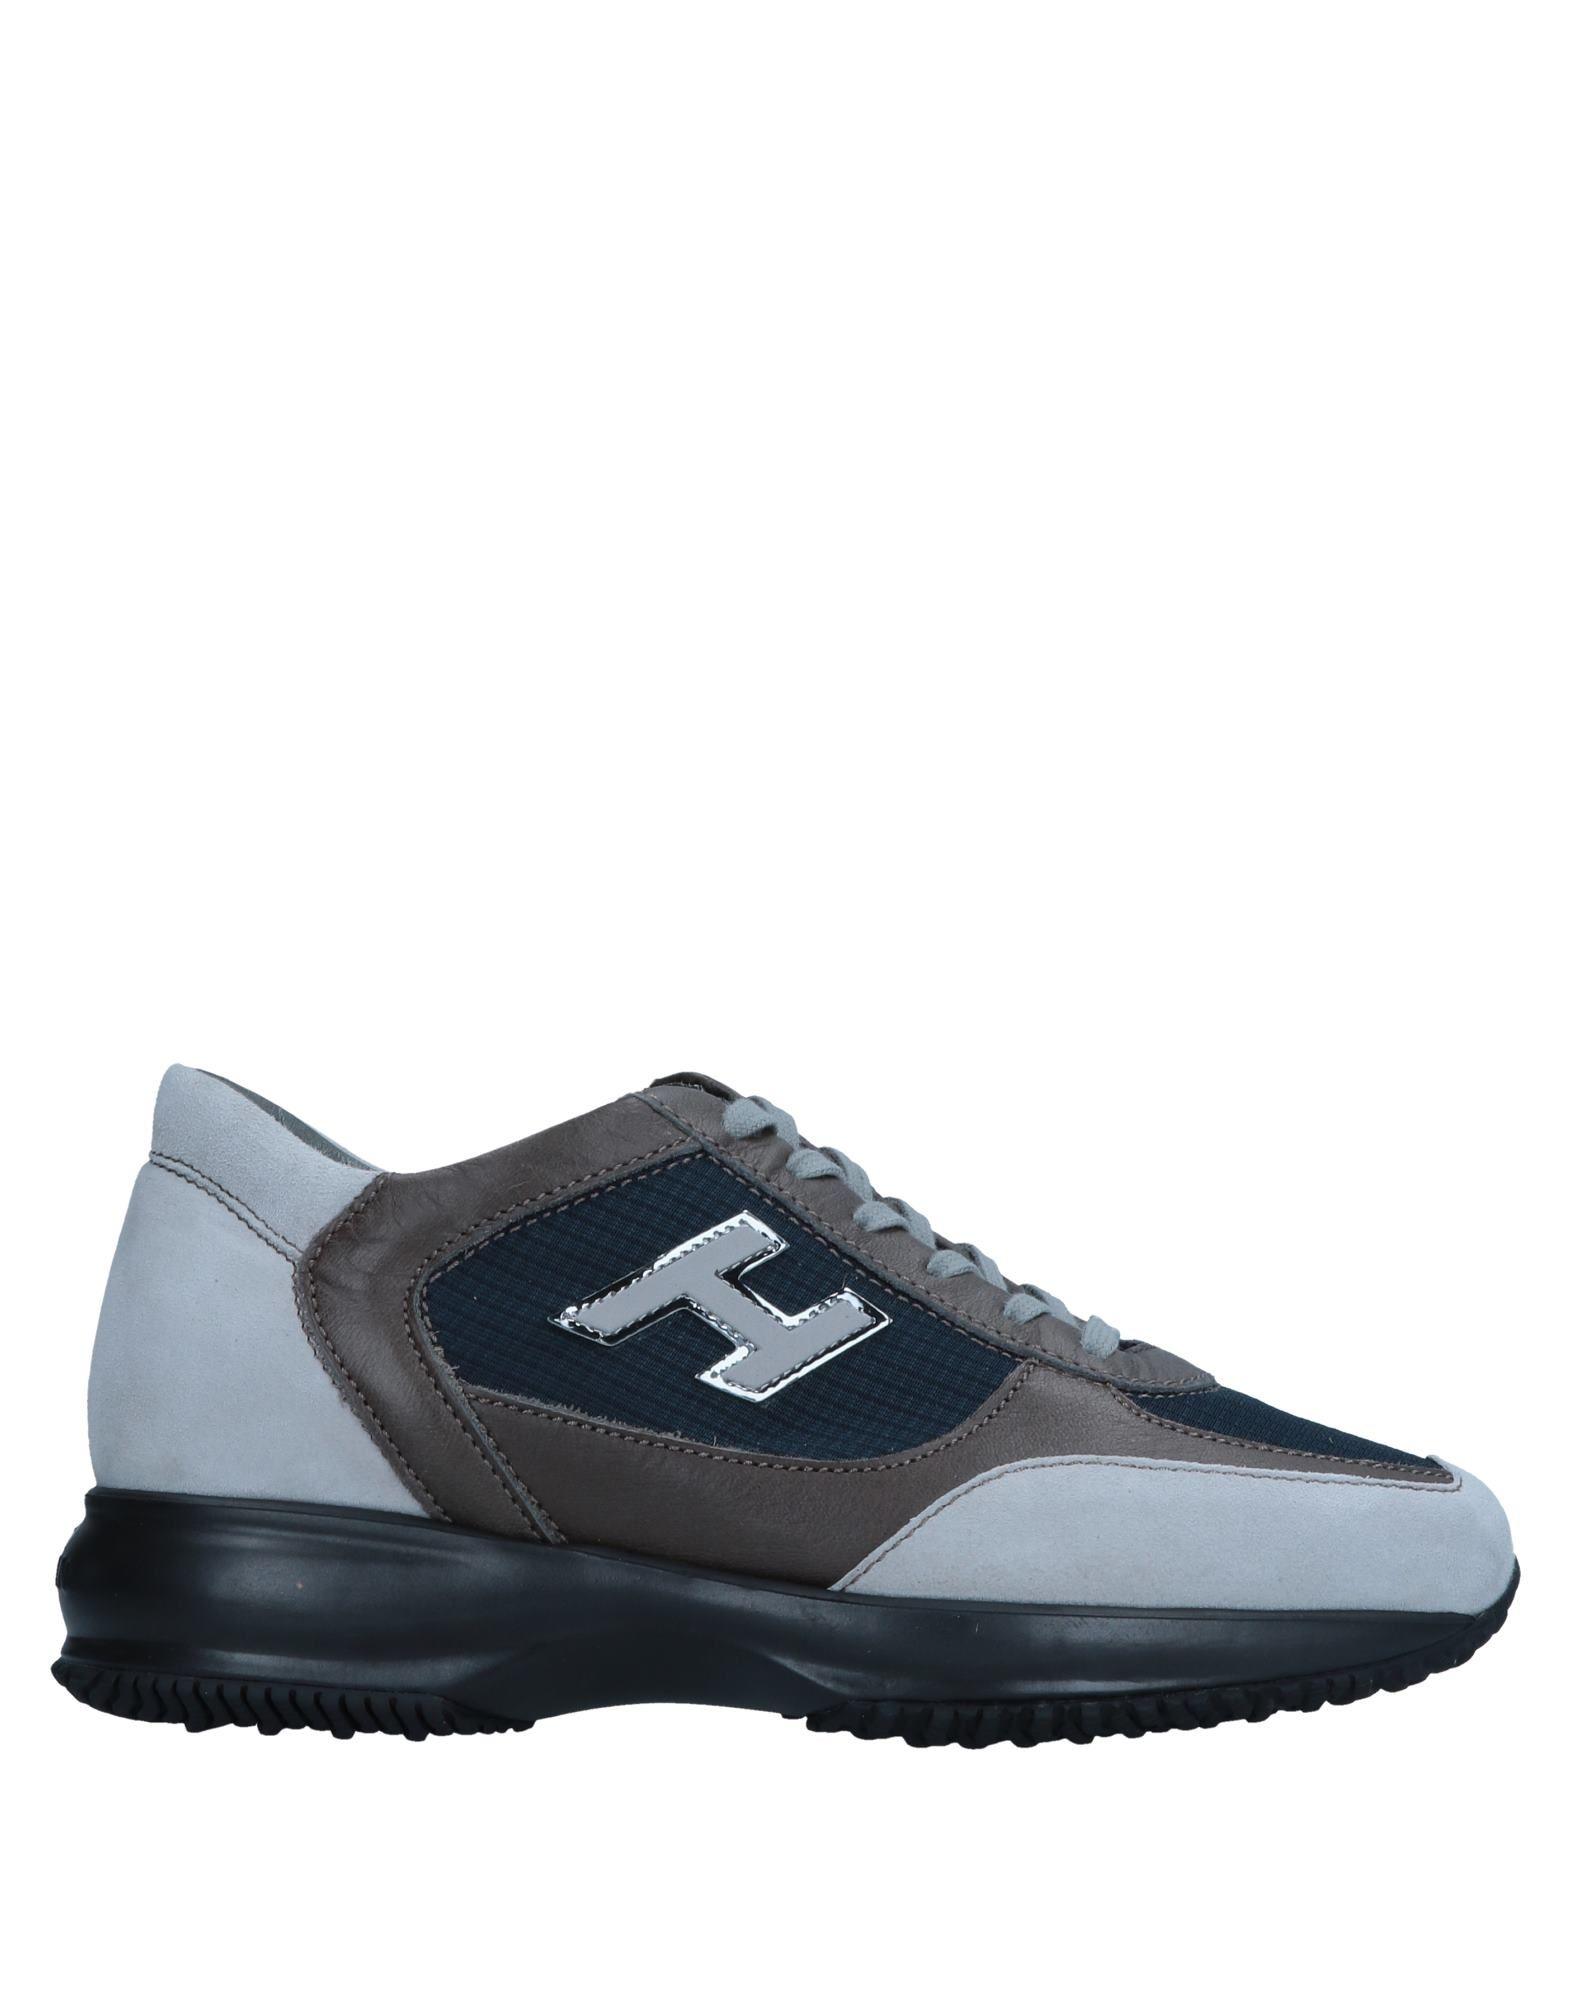 Hogan Sneakers Damen Schuhe  11543618MOGut aussehende strapazierfähige Schuhe Damen 35e305